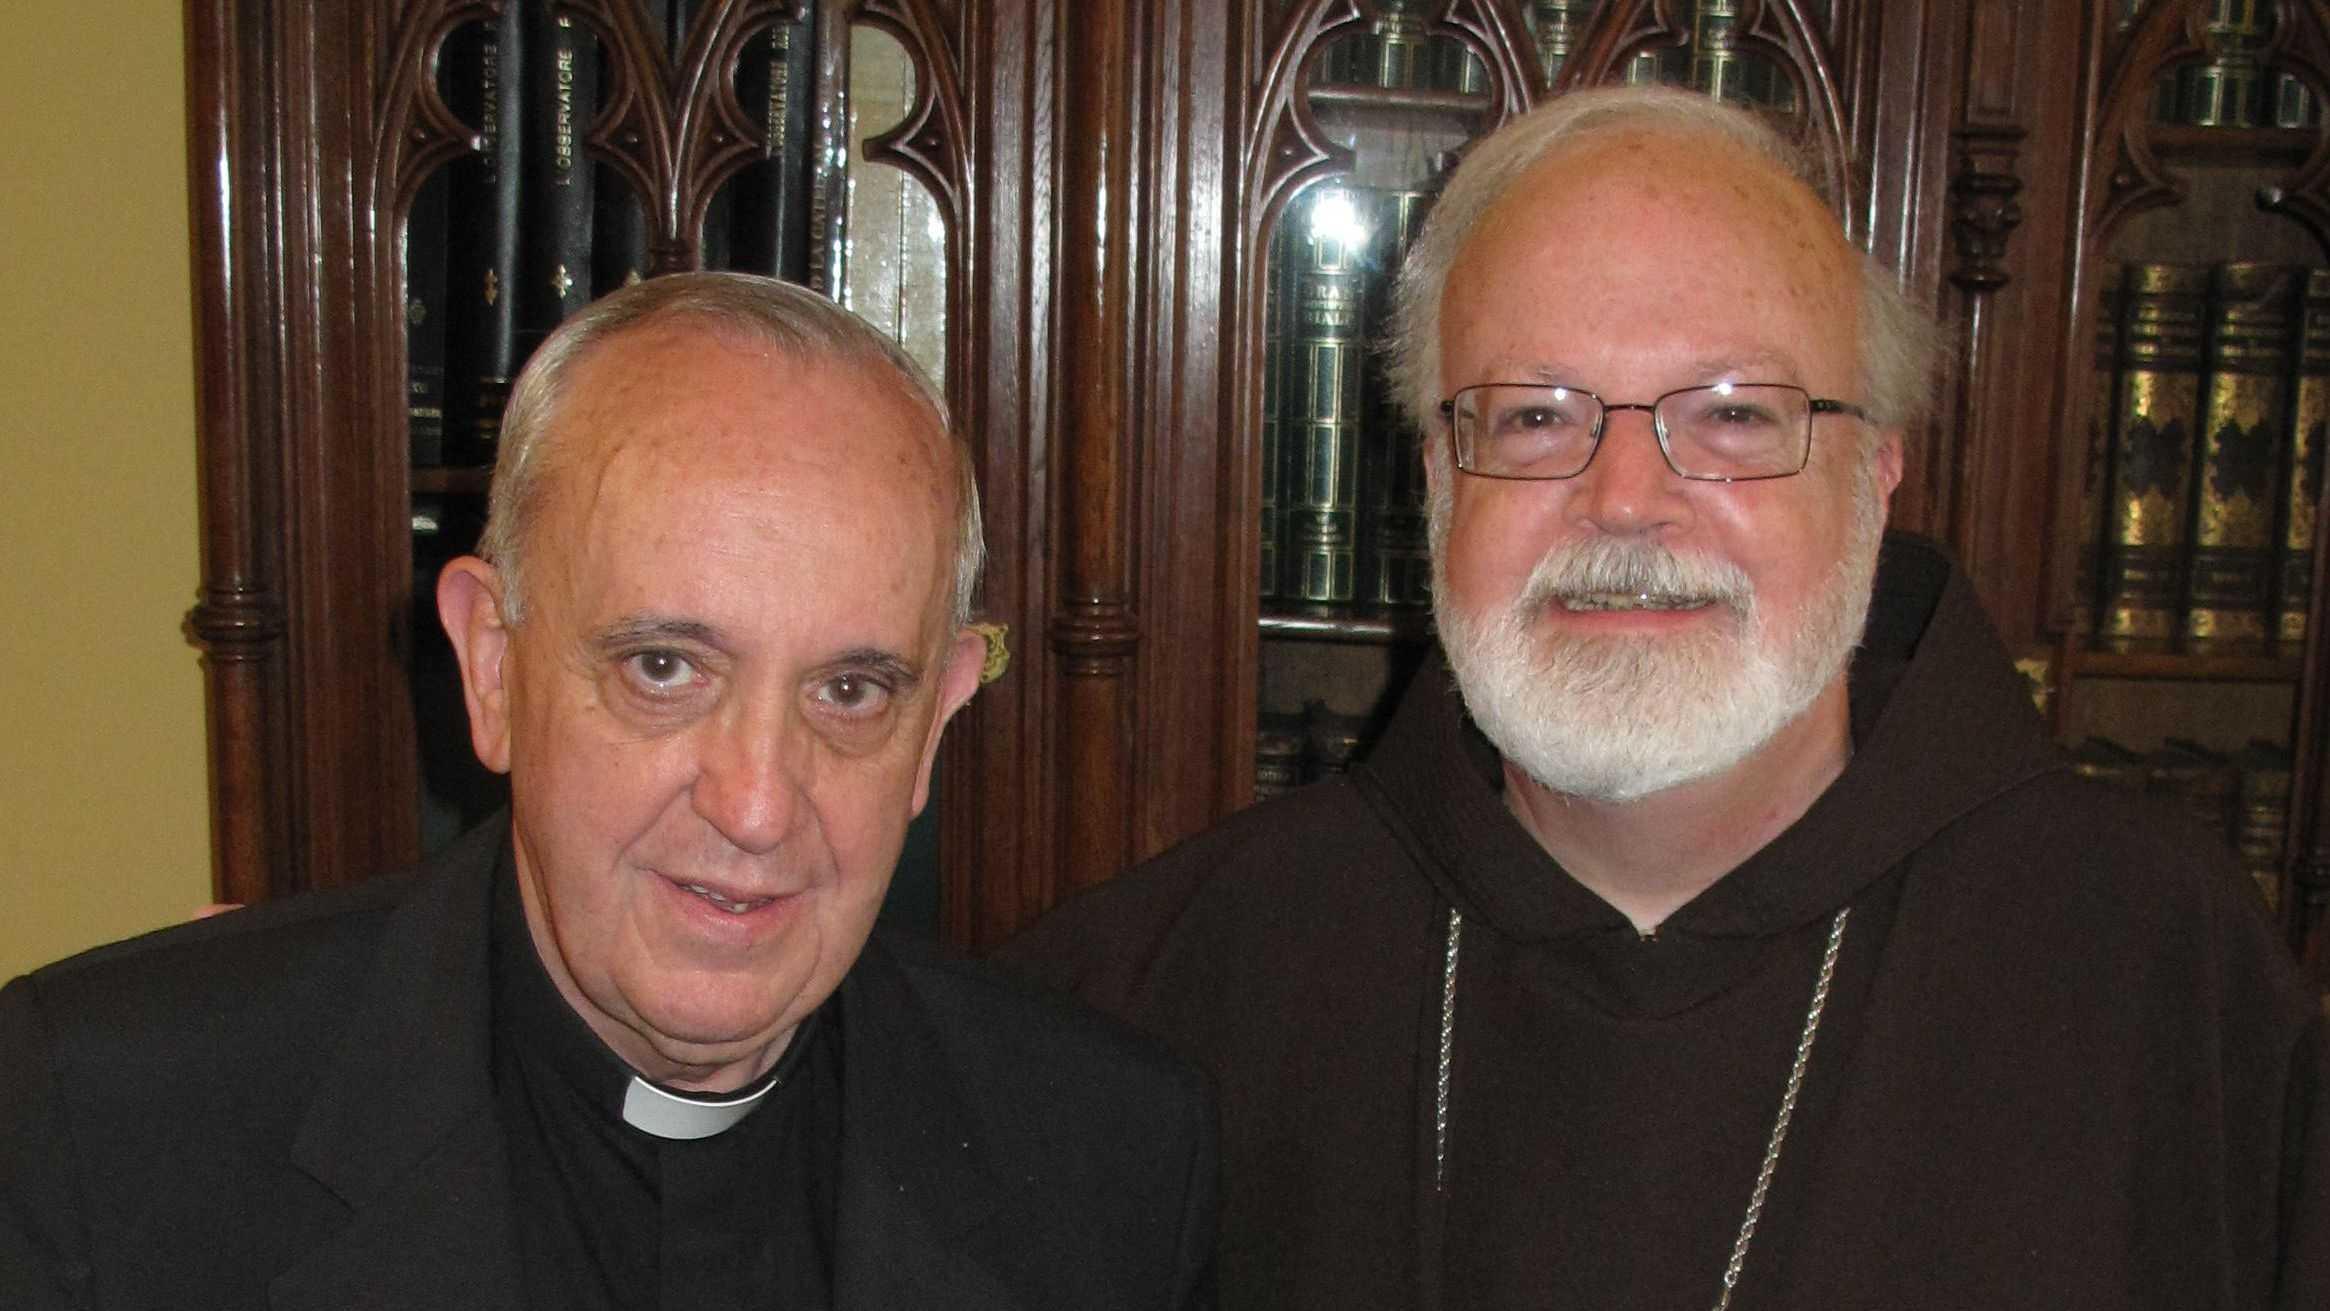 Cardinal Sean O'Malley Cardinal Jorge Bergoglio.jpg